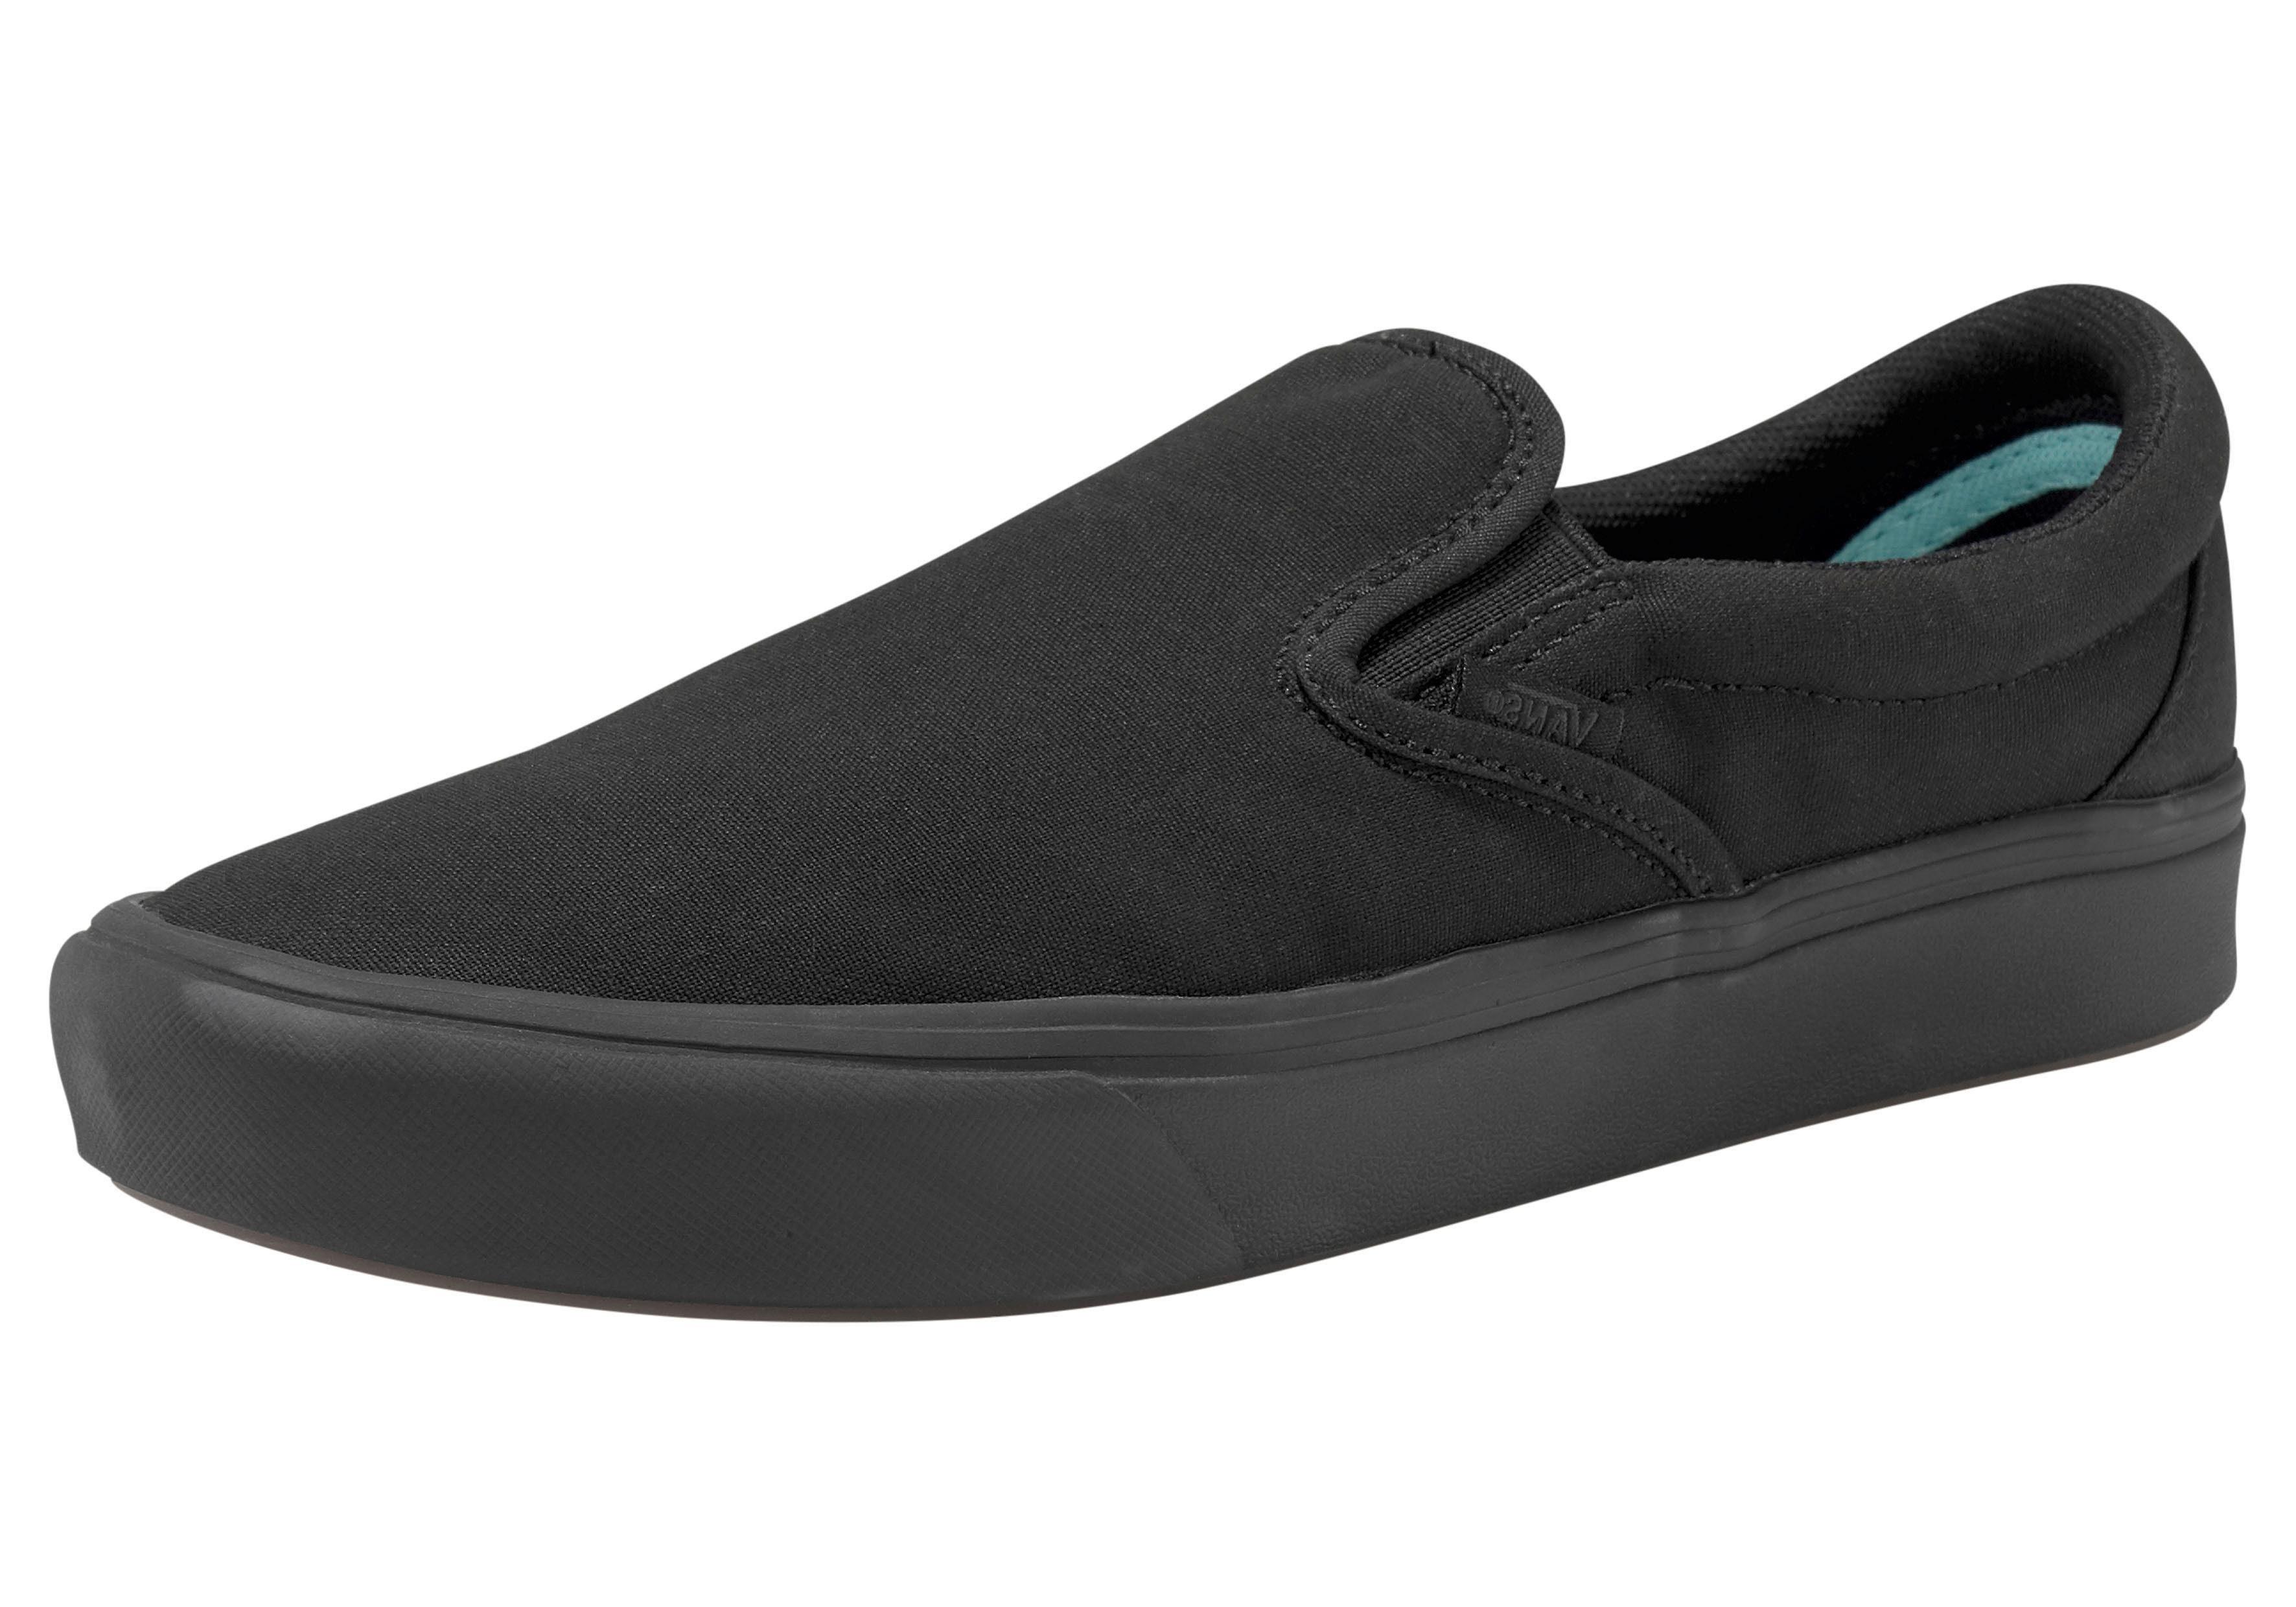 Vans »ComfyCush Slip On« Sneaker online kaufen | OTTO